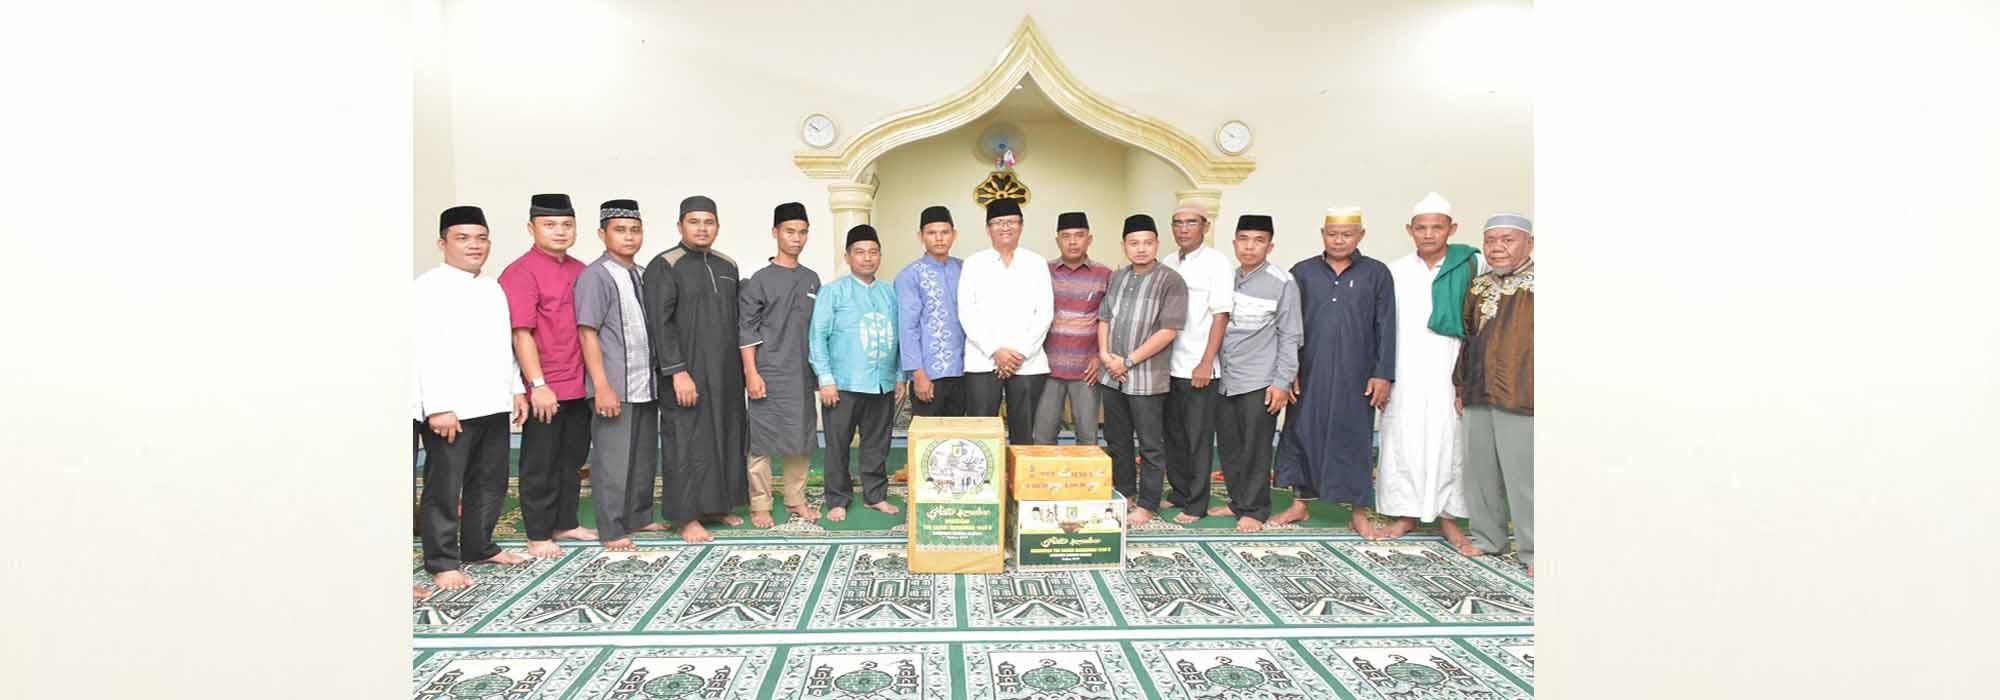 Kabid Penyelenggaraan e-Government Dinas Kominfo Safari Ramadhan Bersama Tim III di Kecamatan Dolok Merawan